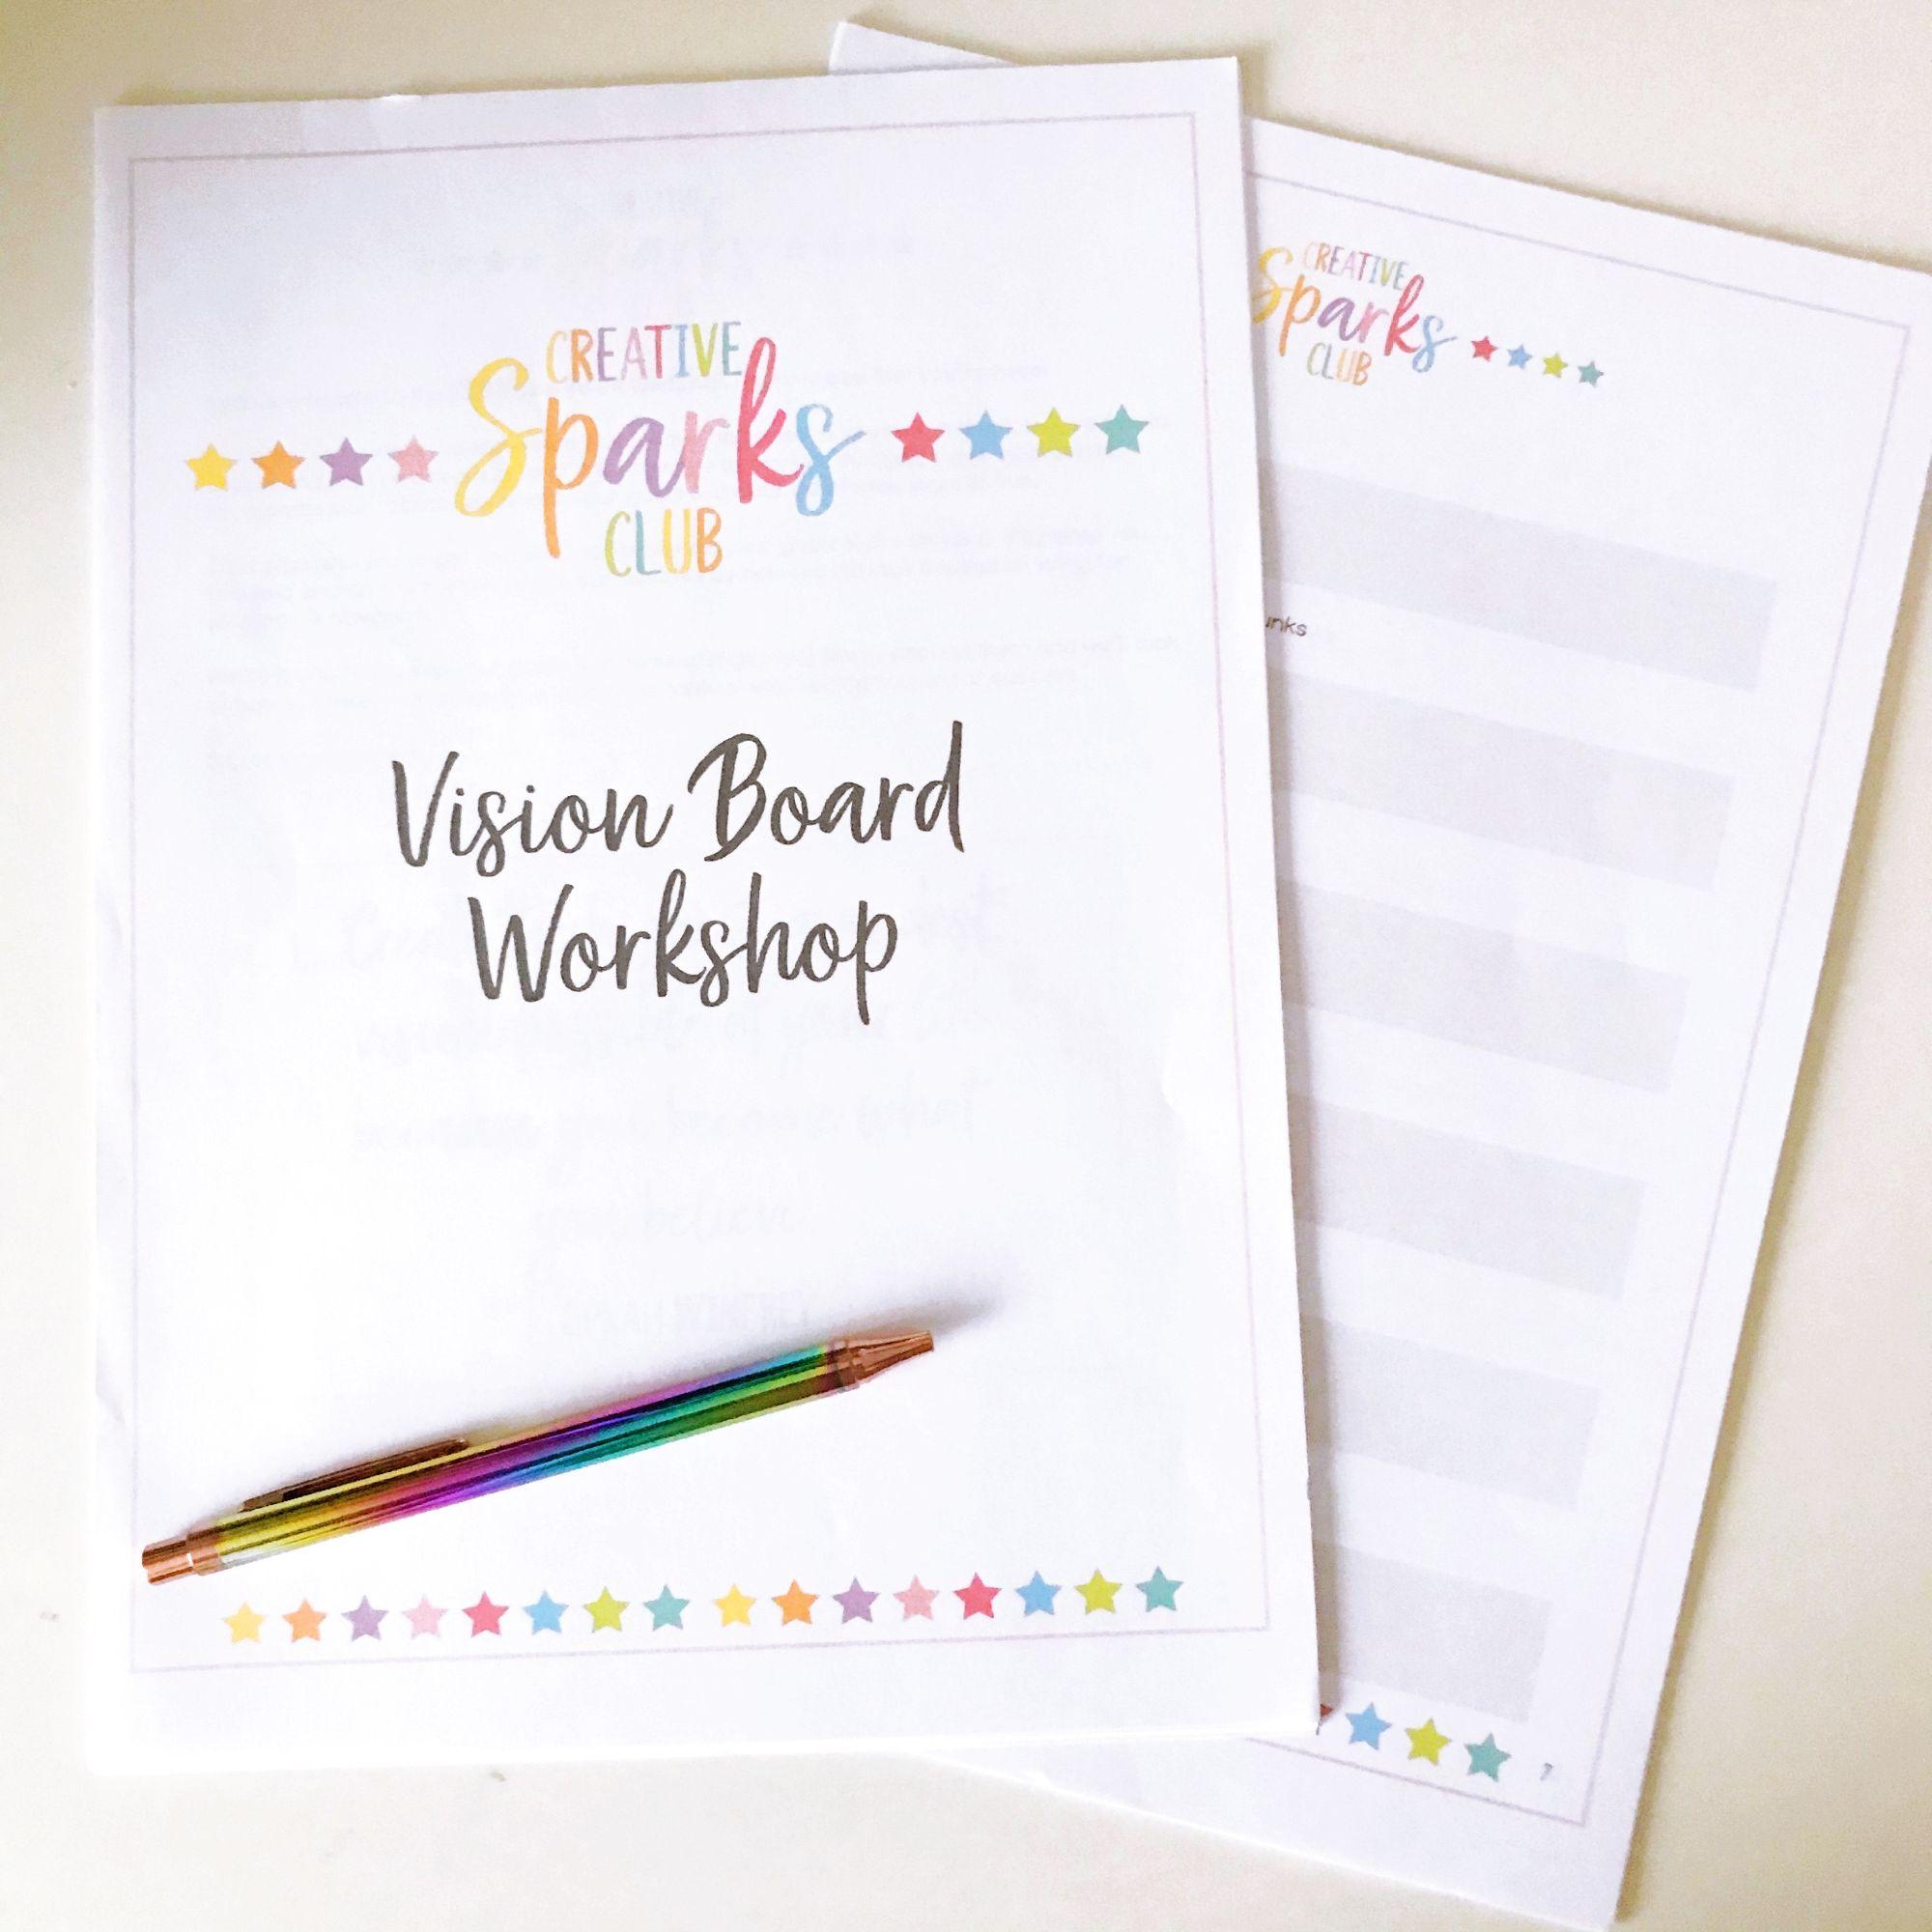 Vision Board Workshop Workbook